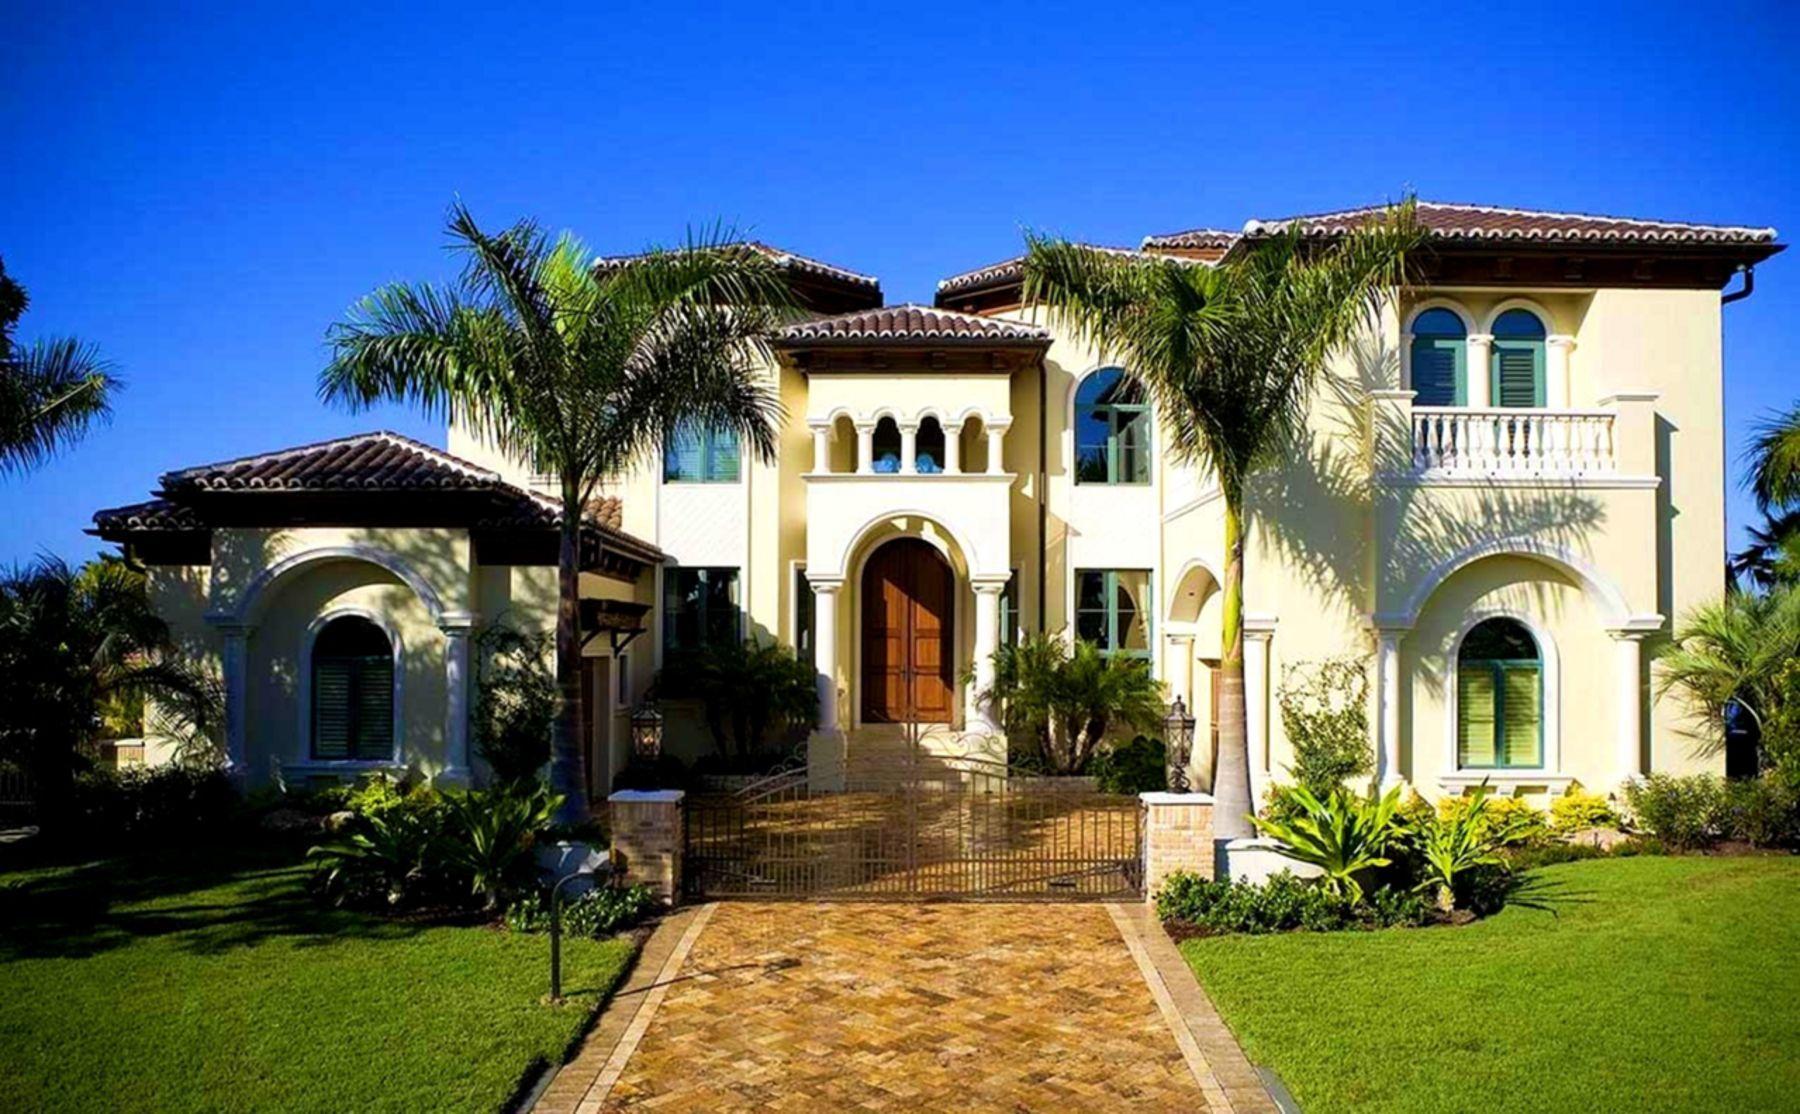 Luxurius Exterior Paint Colors For Mediterranean Style Homes R28 Mediterranean Homes Exterior House Paint Exterior Exterior House Colors